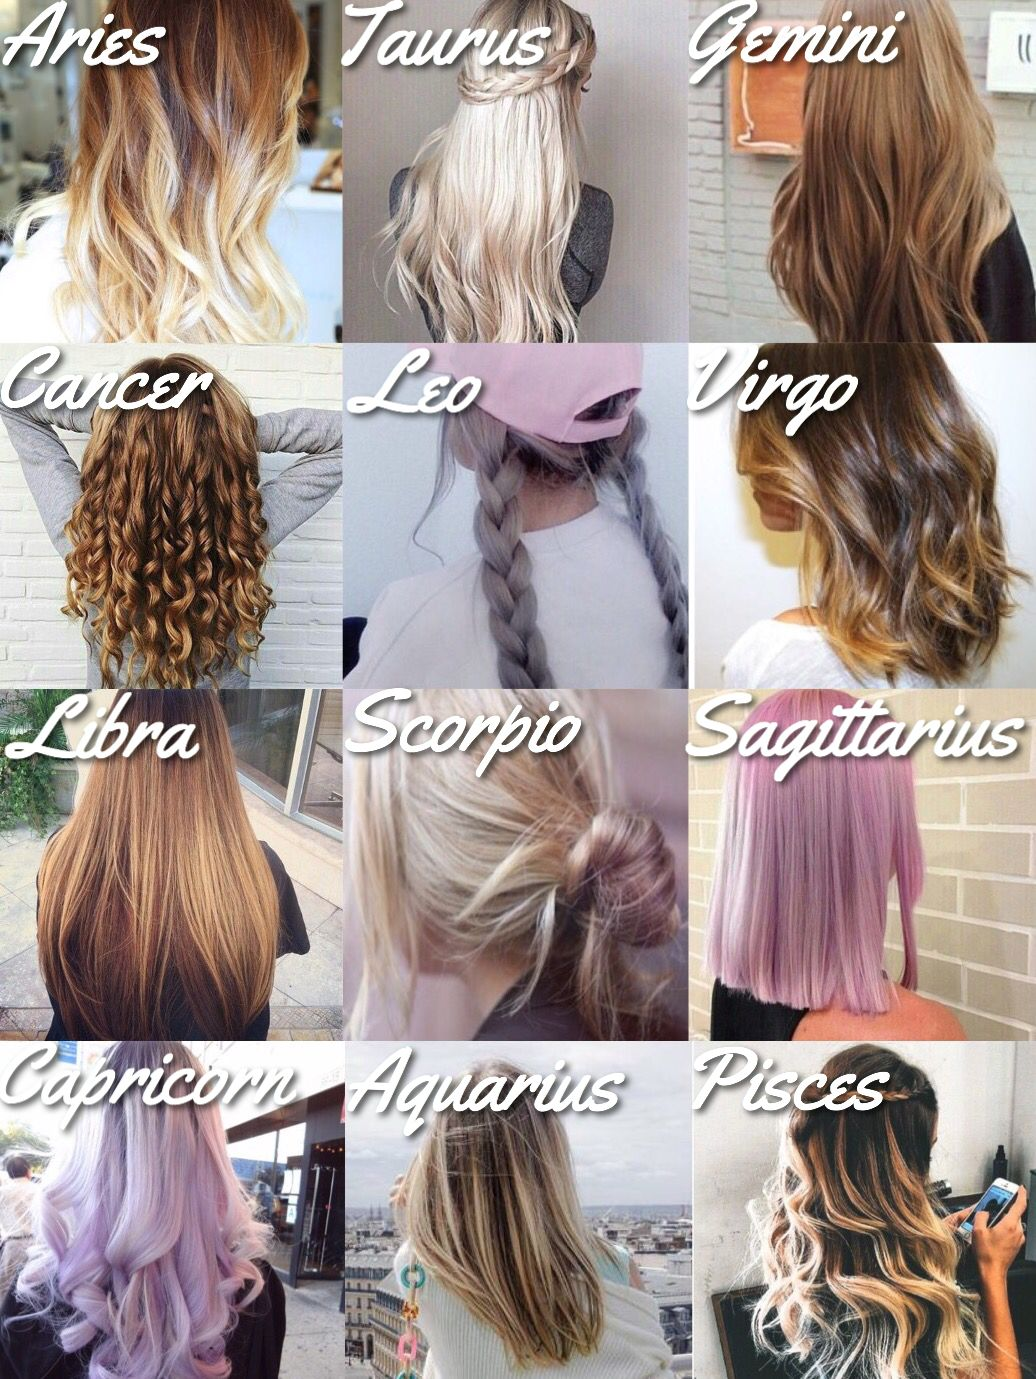 12 zodiac signs hair styles. cancer zodiac sign ♋ | astro